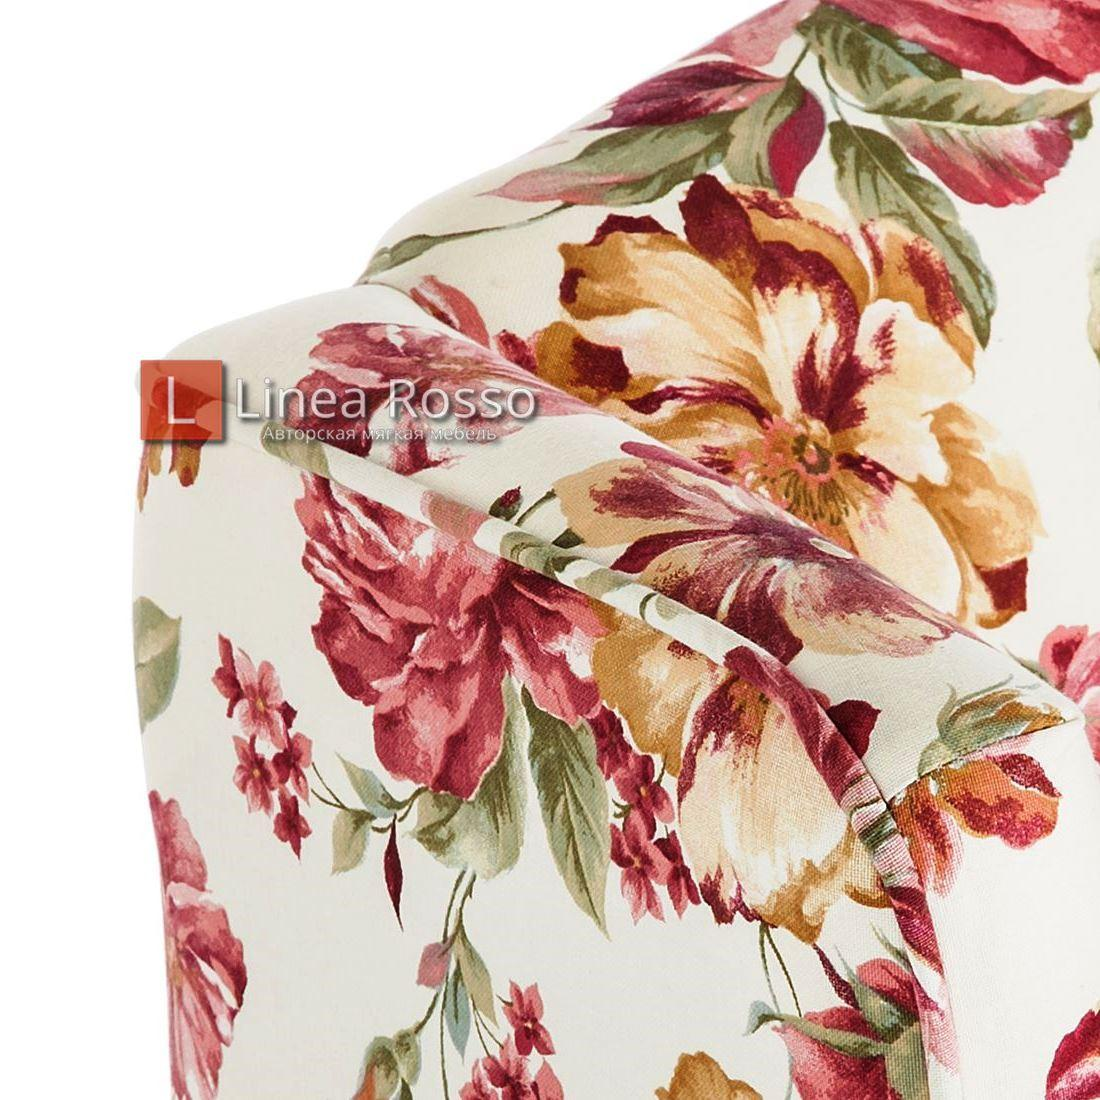 kreslo v tsvetochnyj print7 - Кресло с цветочным принтом на заказ